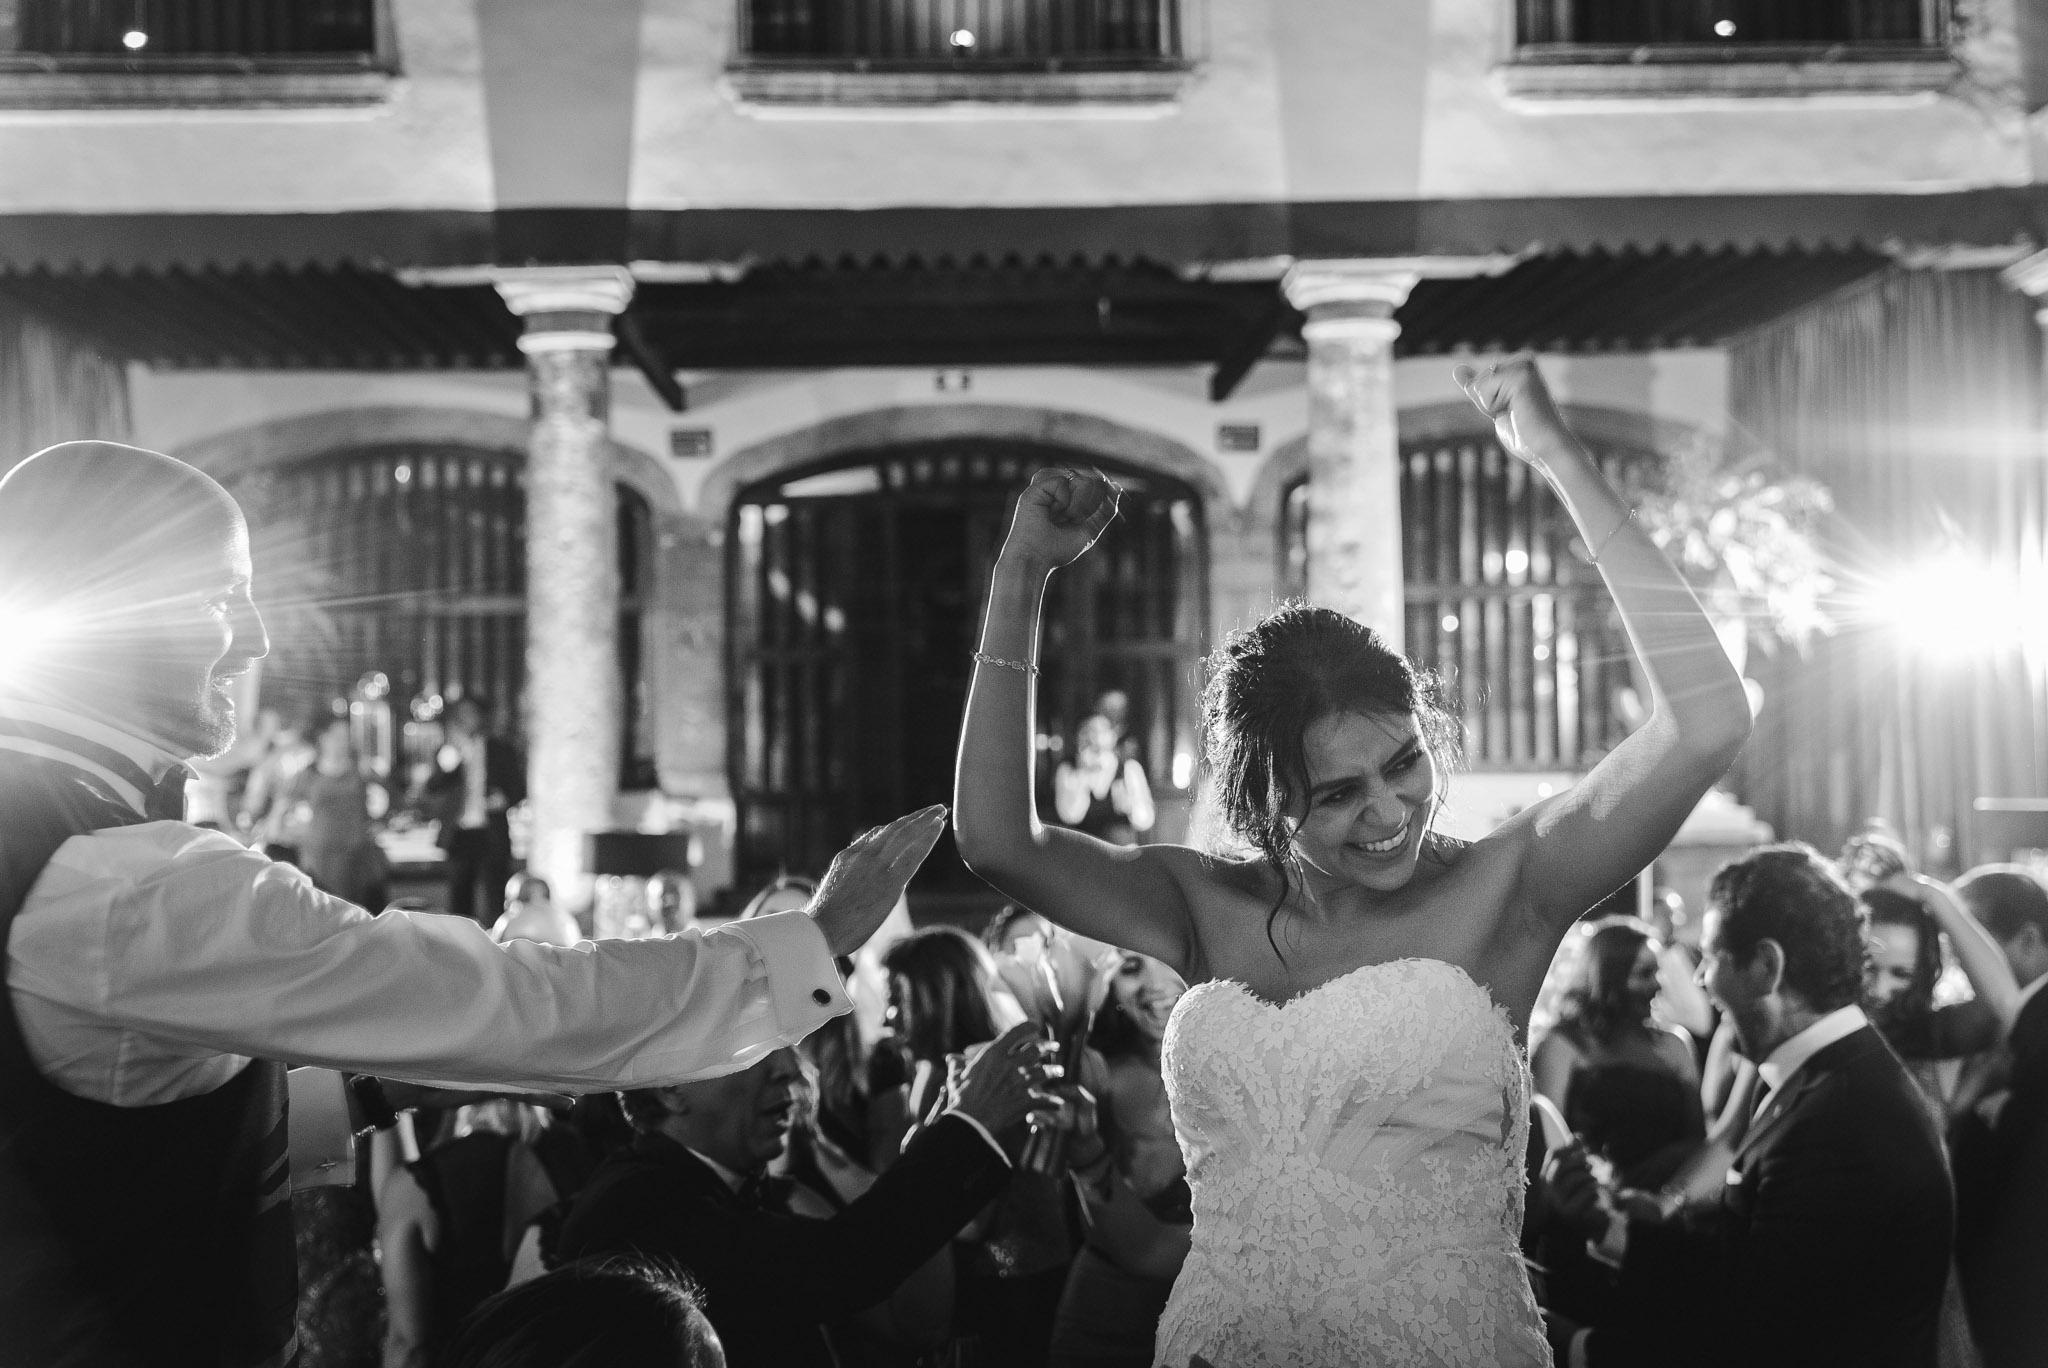 ©www.mauriziosolisbroca.com-20161002maurizio-solis-broca-mexico-canada-wedding-photographer20161002DSC00424-2-Edit.jpg